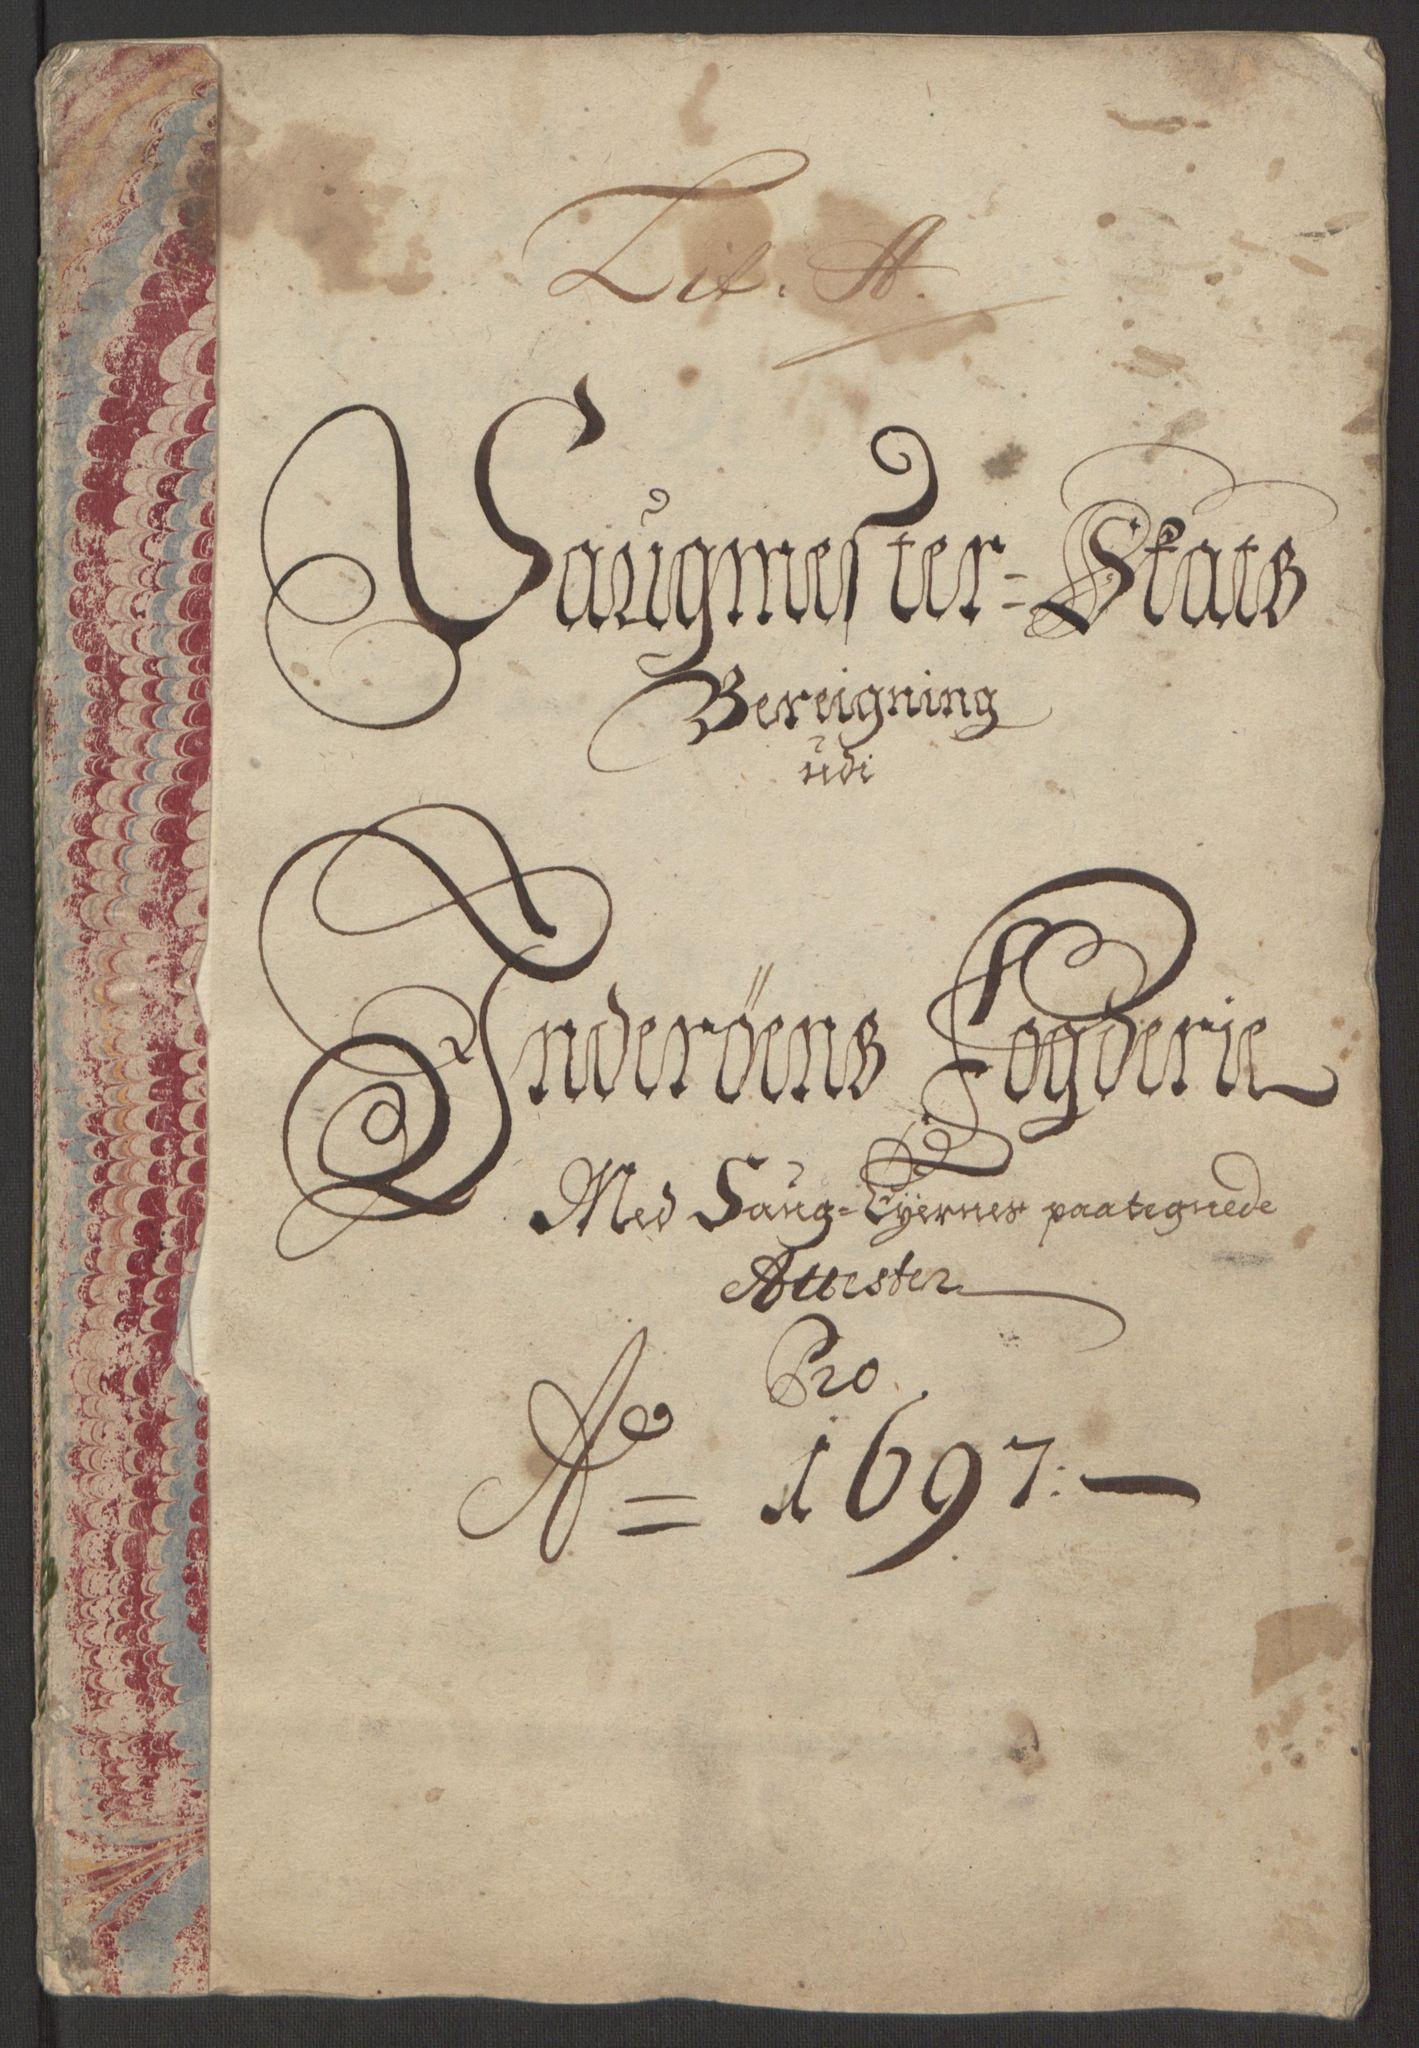 RA, Rentekammeret inntil 1814, Reviderte regnskaper, Fogderegnskap, R63/L4309: Fogderegnskap Inderøy, 1695-1697, s. 389